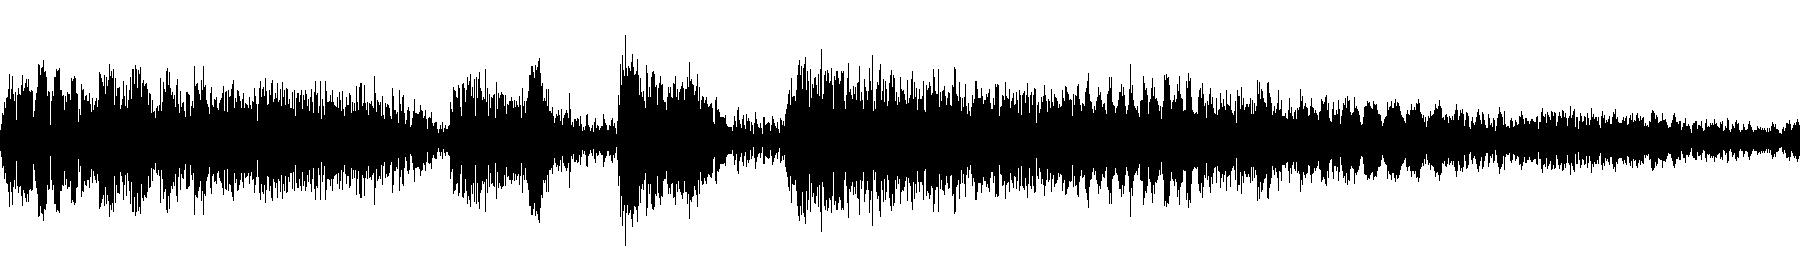 shs ch musicloop 125 epiano3 am